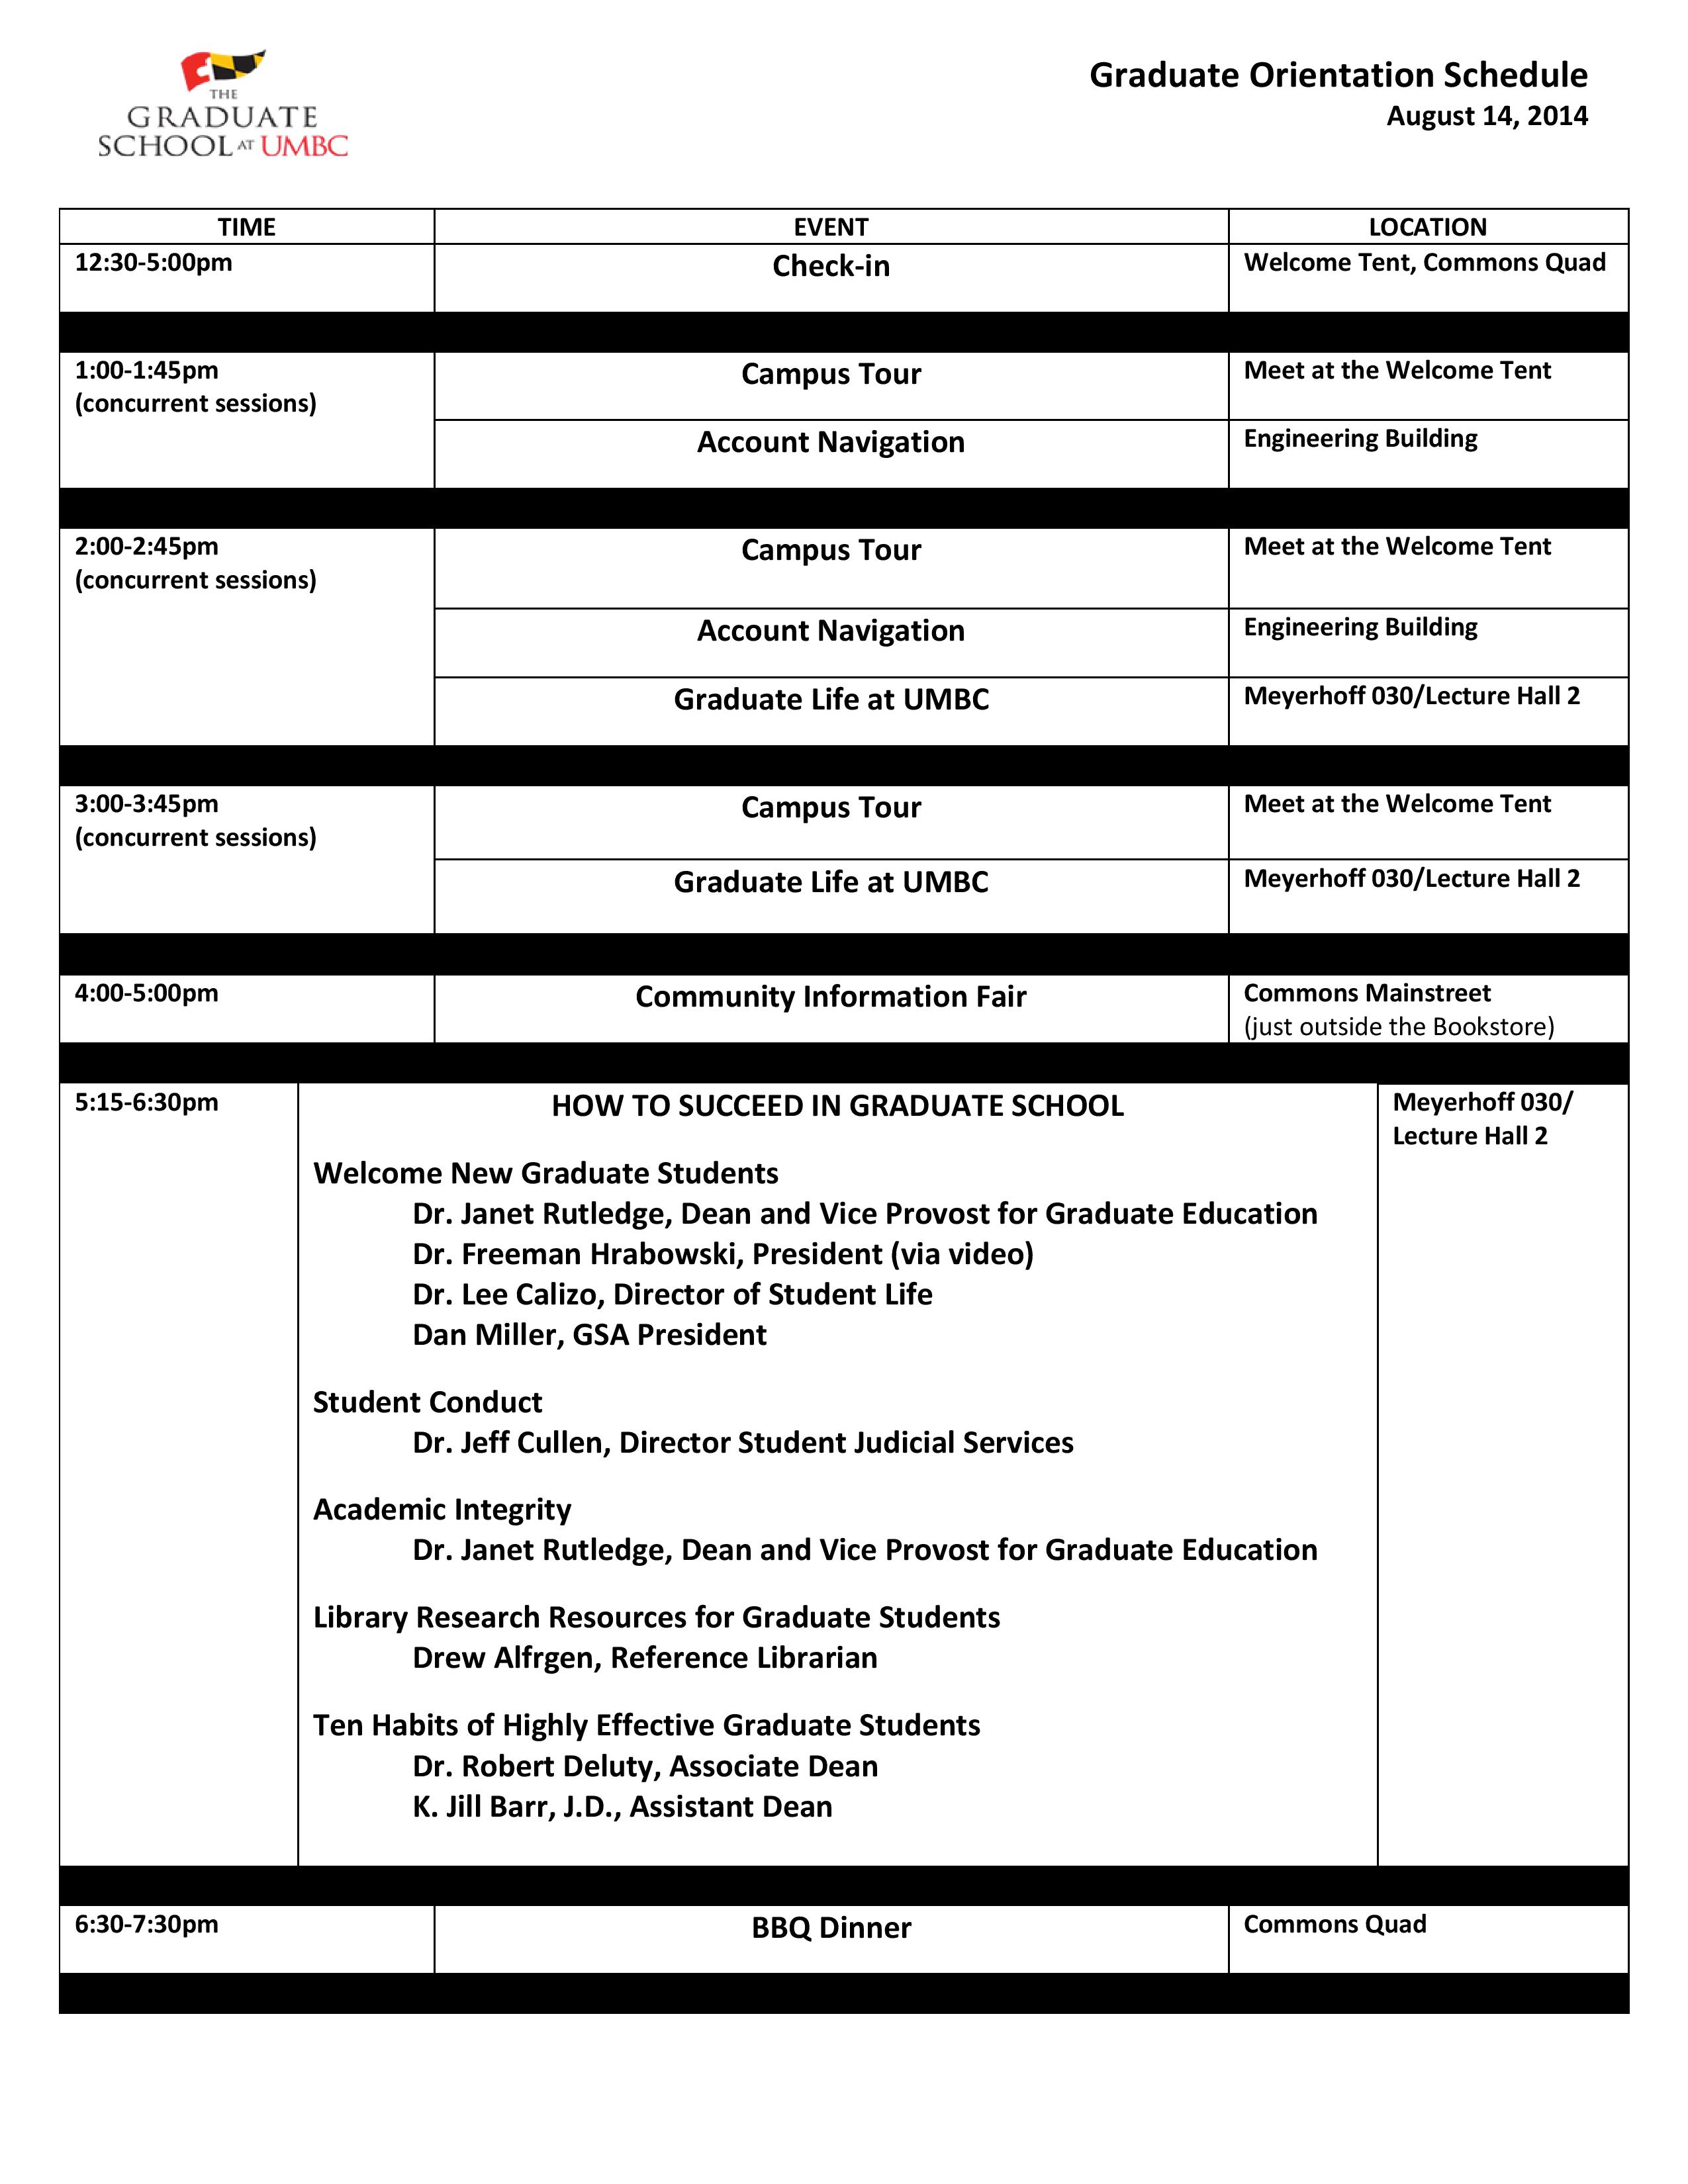 Fall 2014 Orientation Schedule